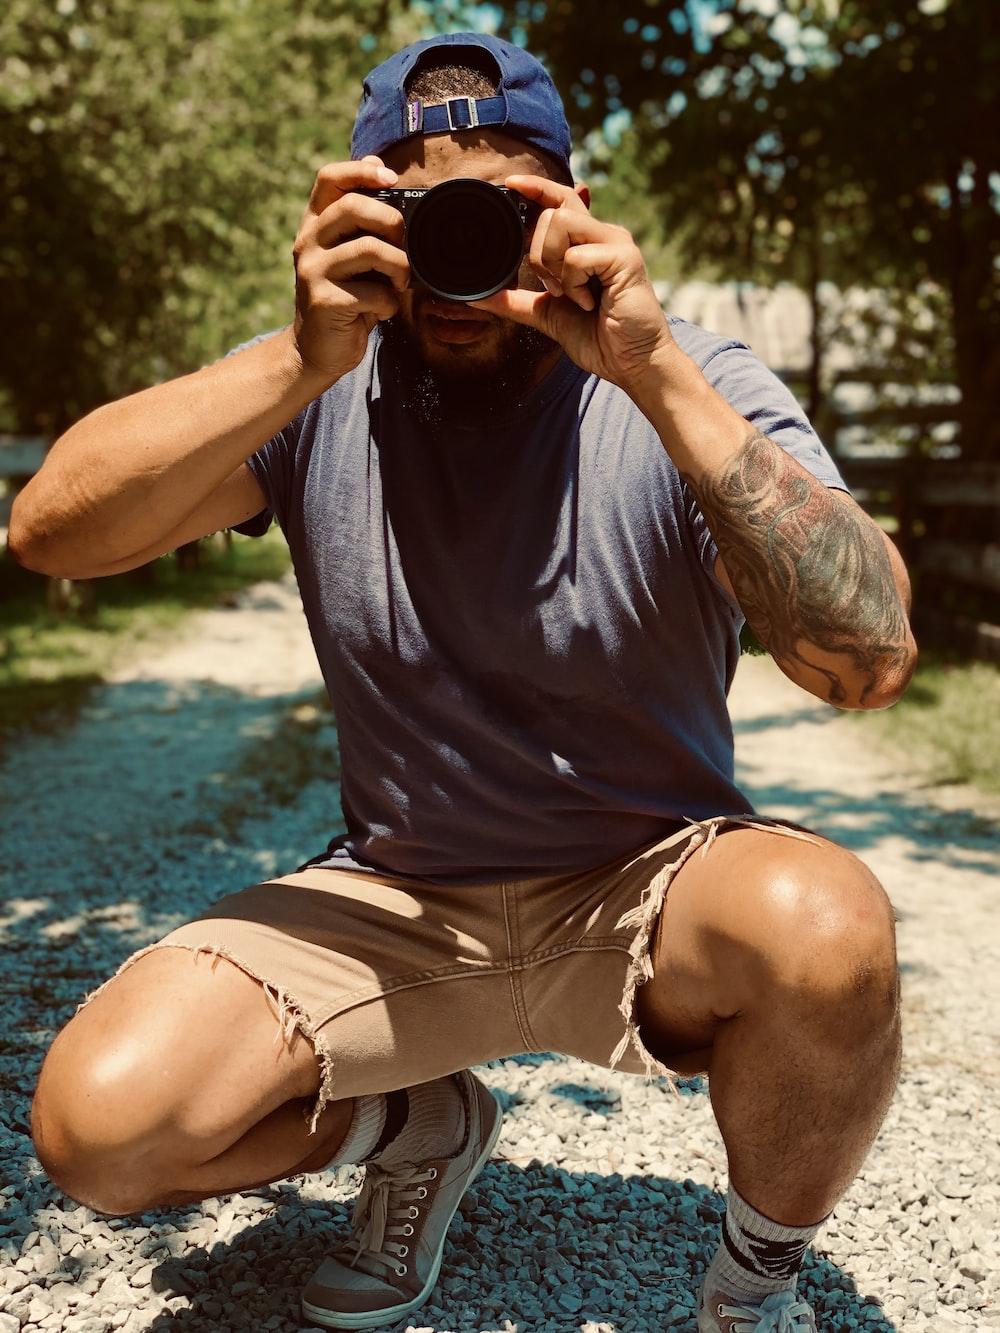 man in black crew neck t-shirt and white shorts drinking from black ceramic mug